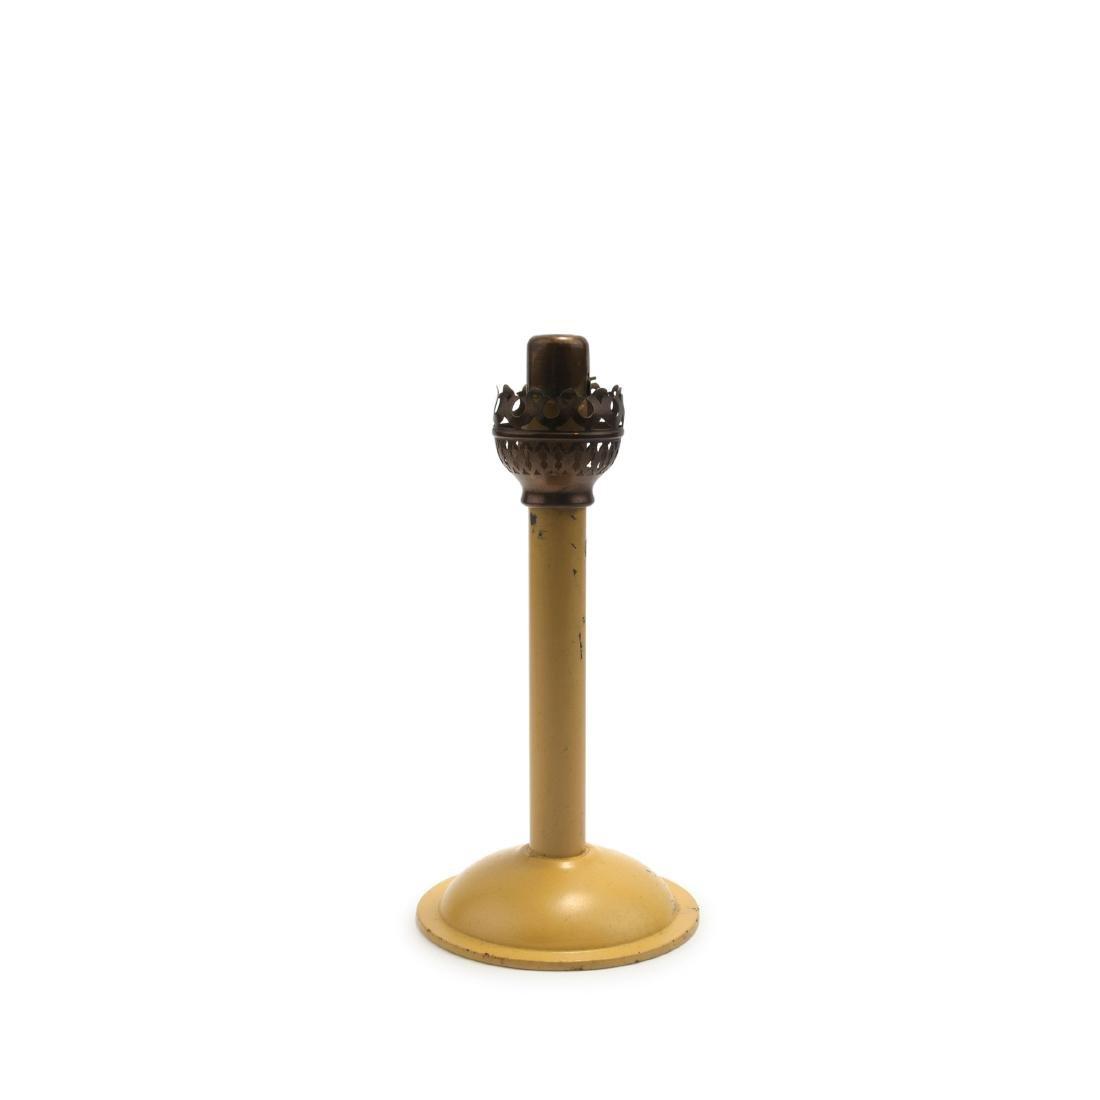 Candlestick, 1929-32